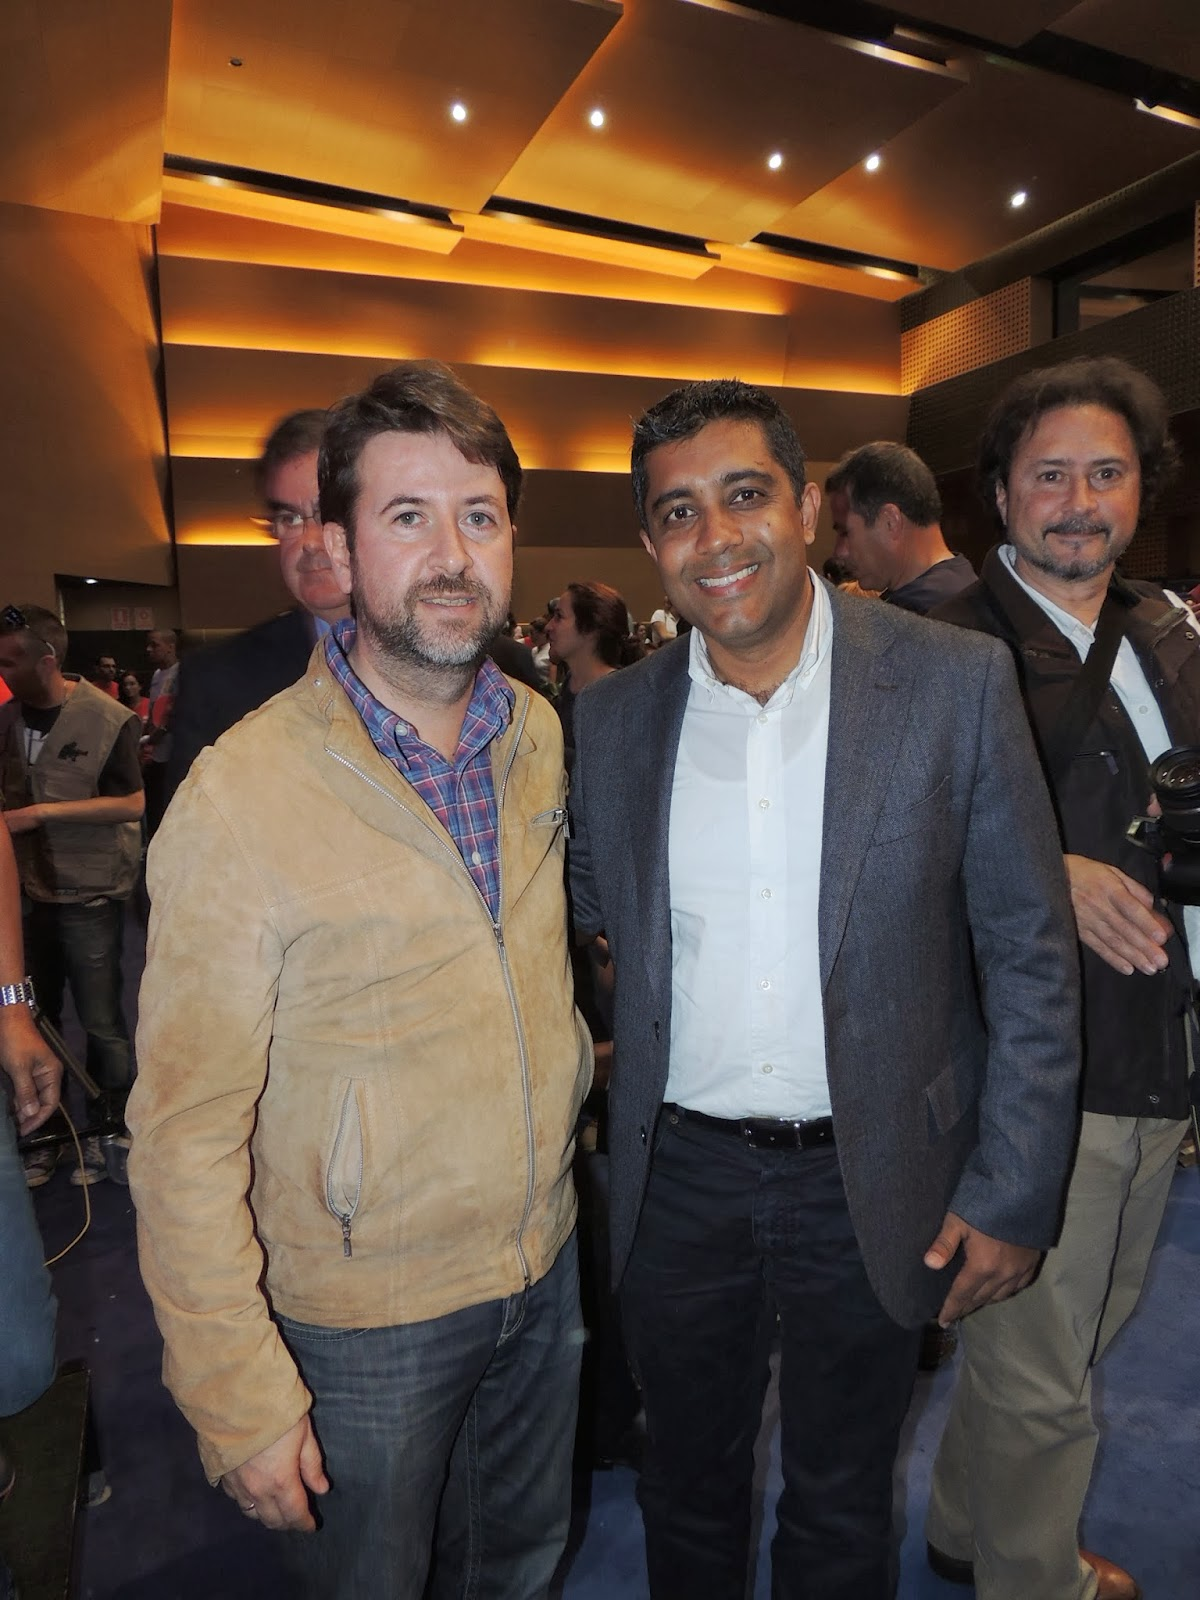 Girish Aidasani director de ROBOTIX Canarias junto al Presidente del Cabildo de Tenerife D. Carlos Alonso